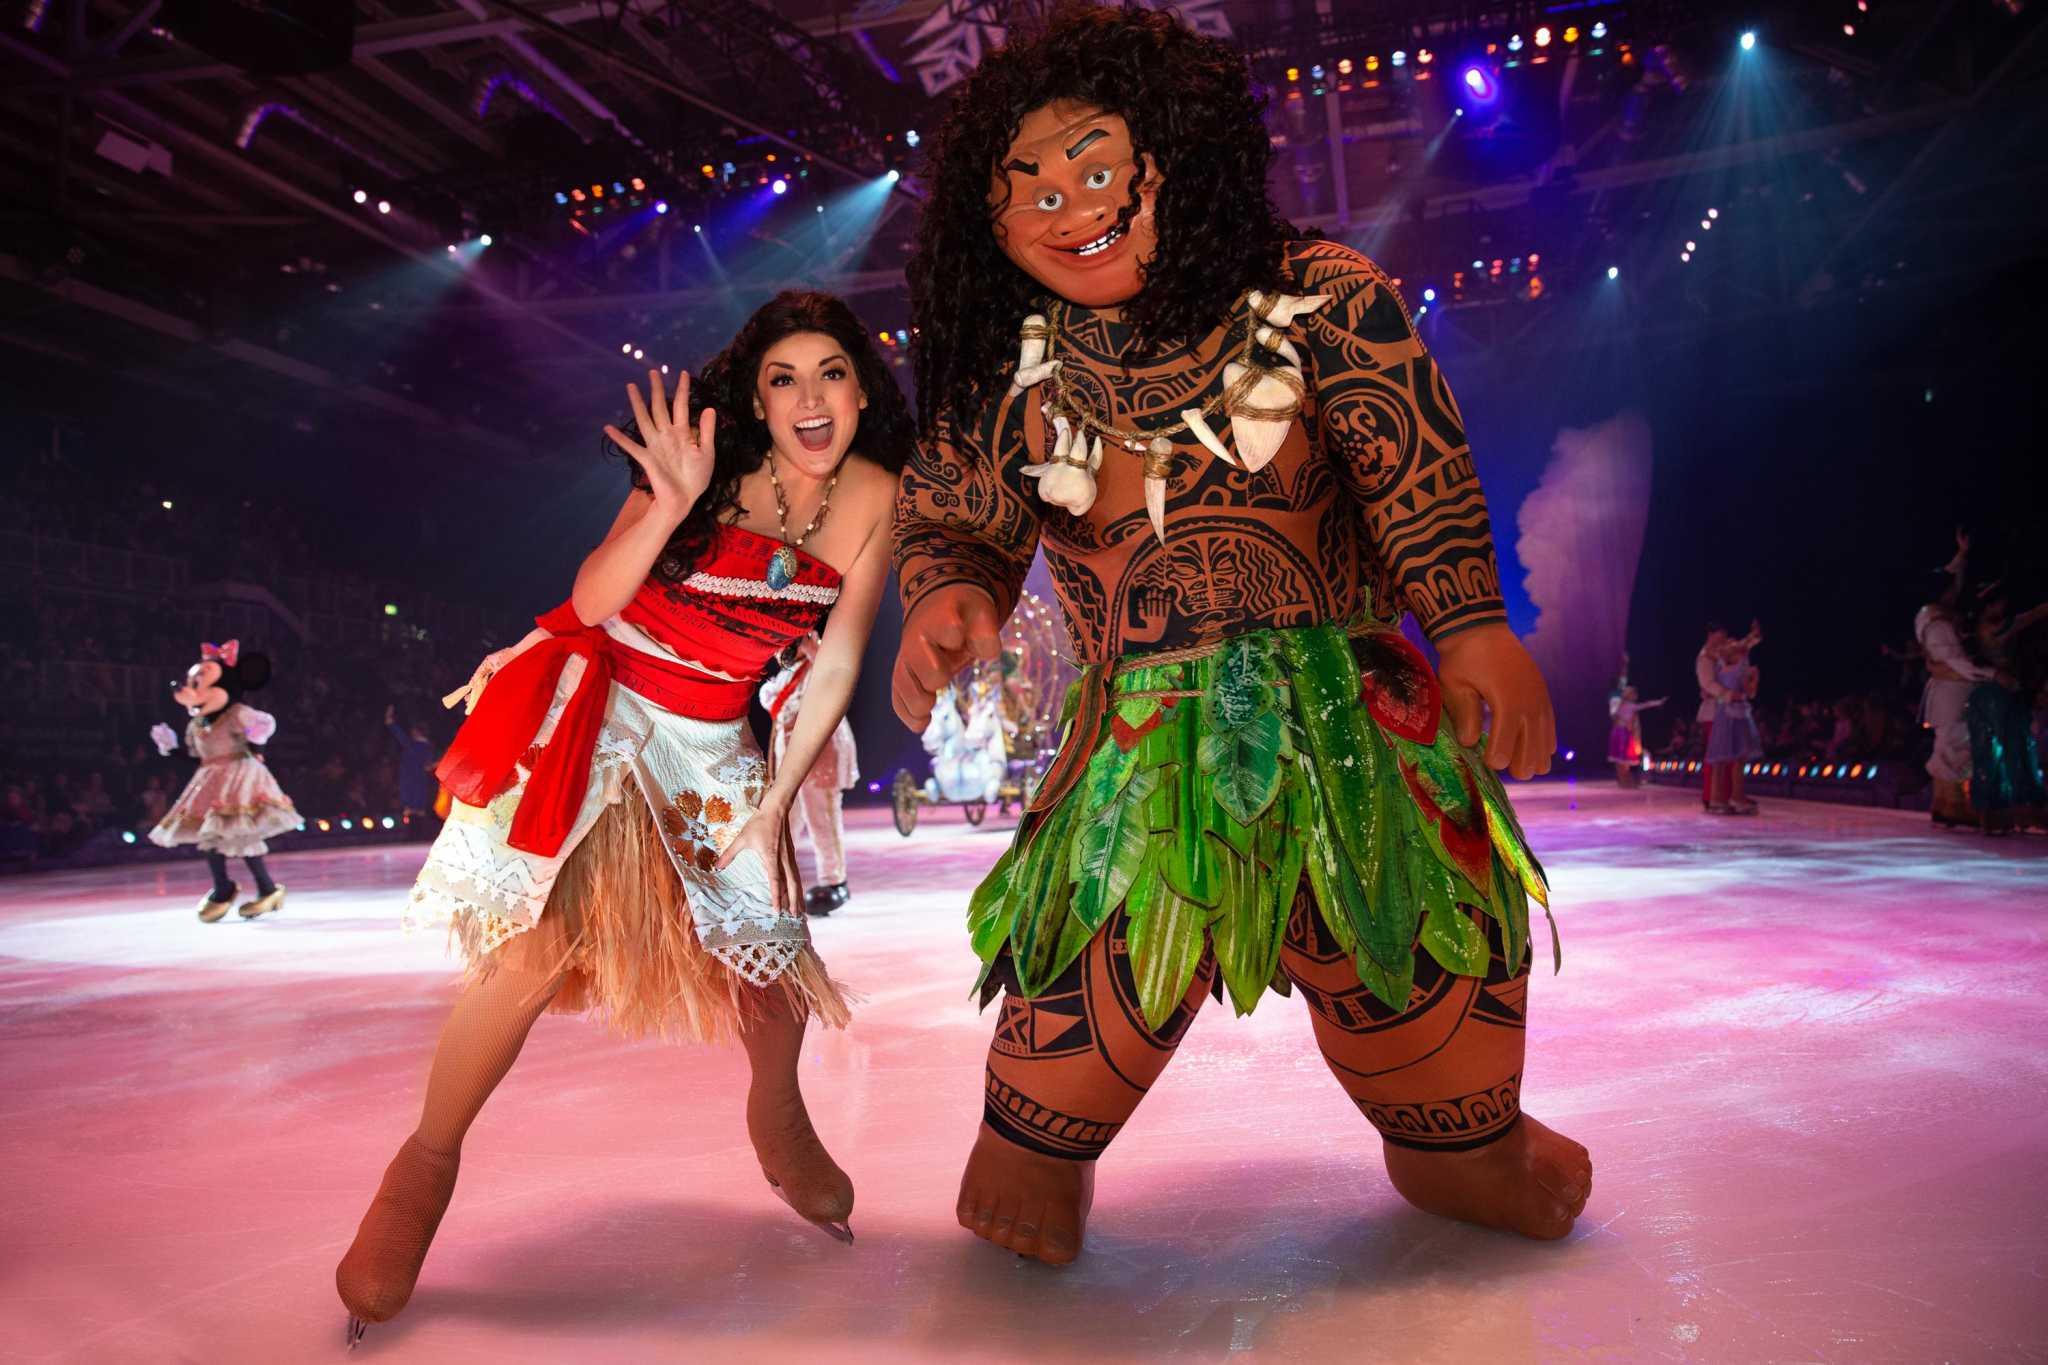 Disney On Ice's 'Dream Big' coming to Bridgeport January 2-5